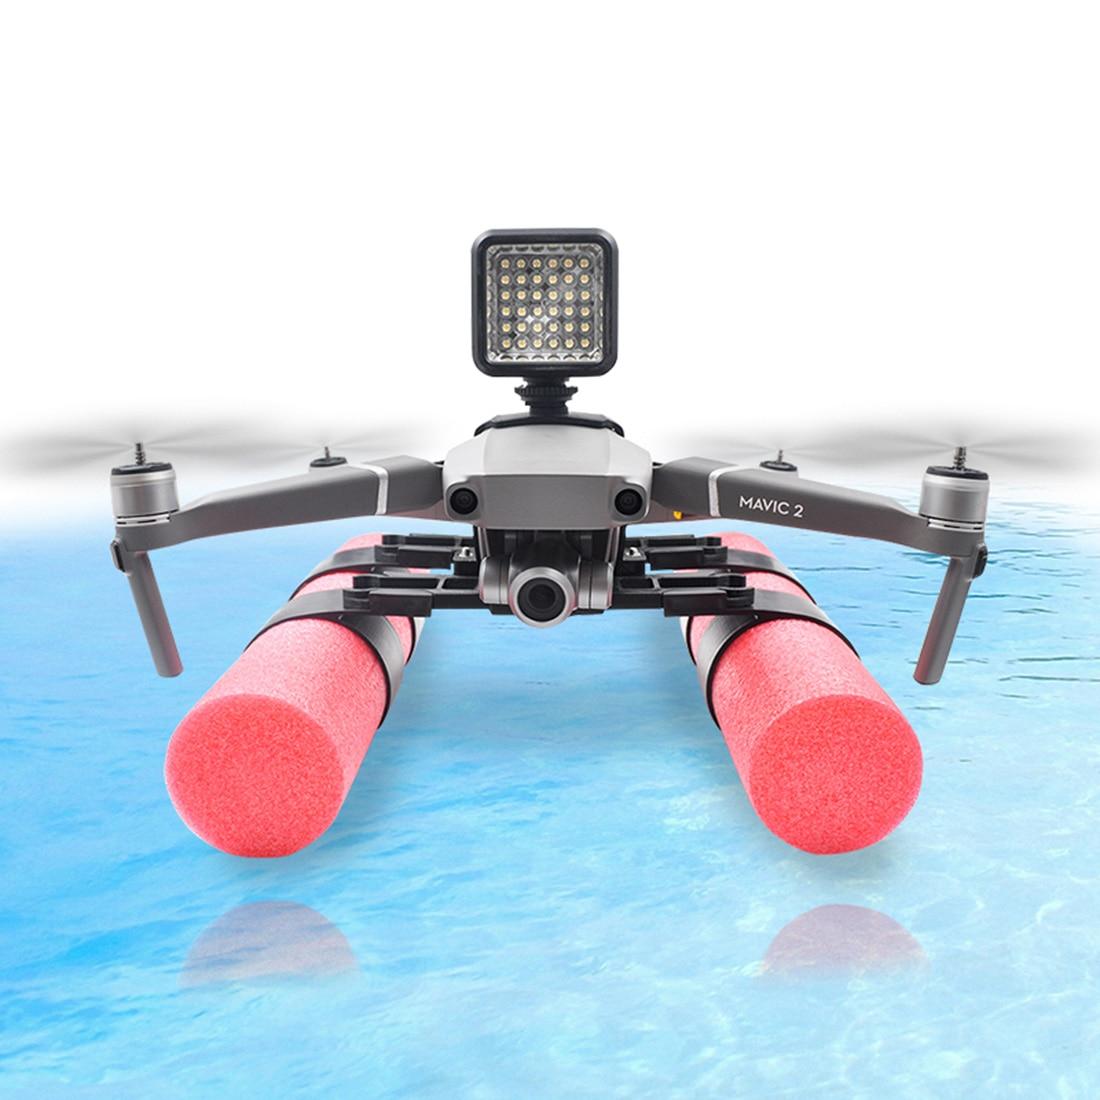 extended-landing-gear-skid-training-floating-bobber-fixer-set-for-dji-font-b-mavic-b-font-2-pro-font-b-mavic-b-font-2-zoom-with-buoyancy-rod-holder